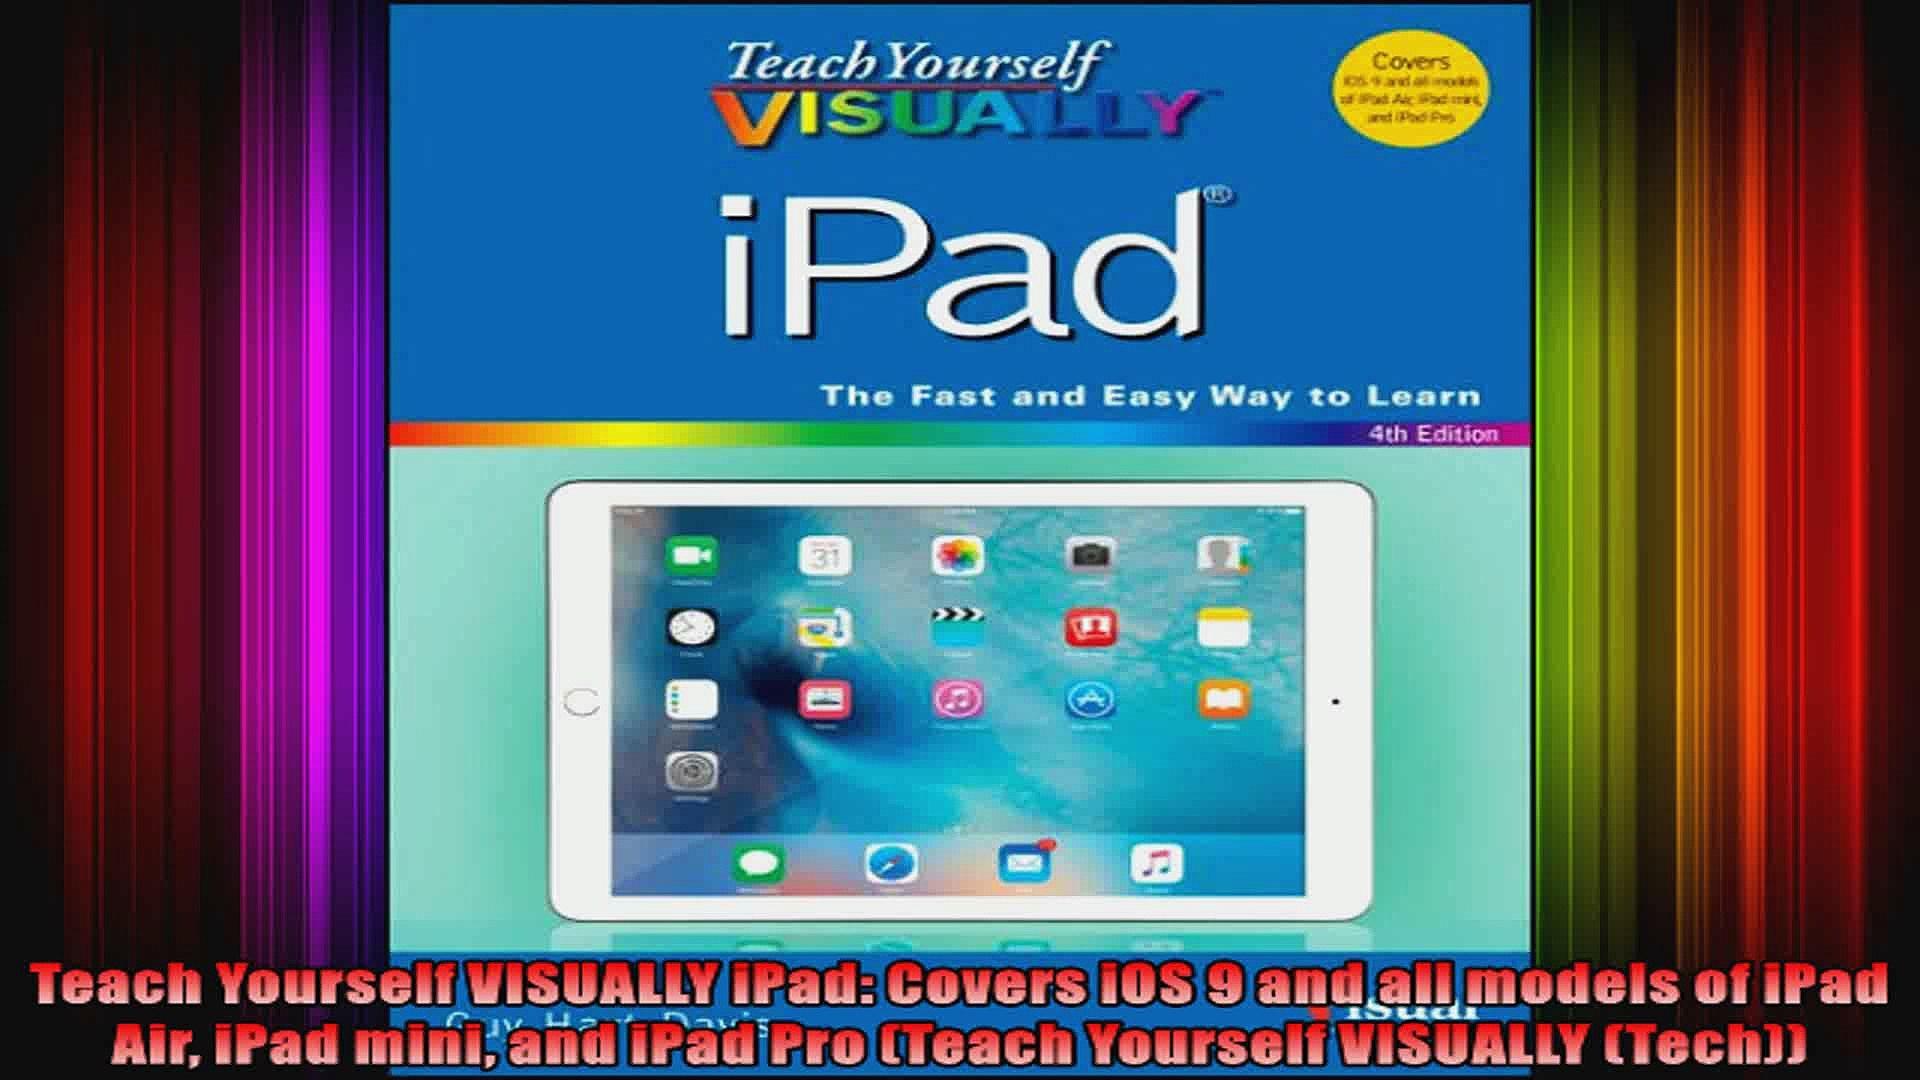 and iPad Pro Covers iOS 9 and all models of iPad Air Teach Yourself VISUALLY iPad iPad mini